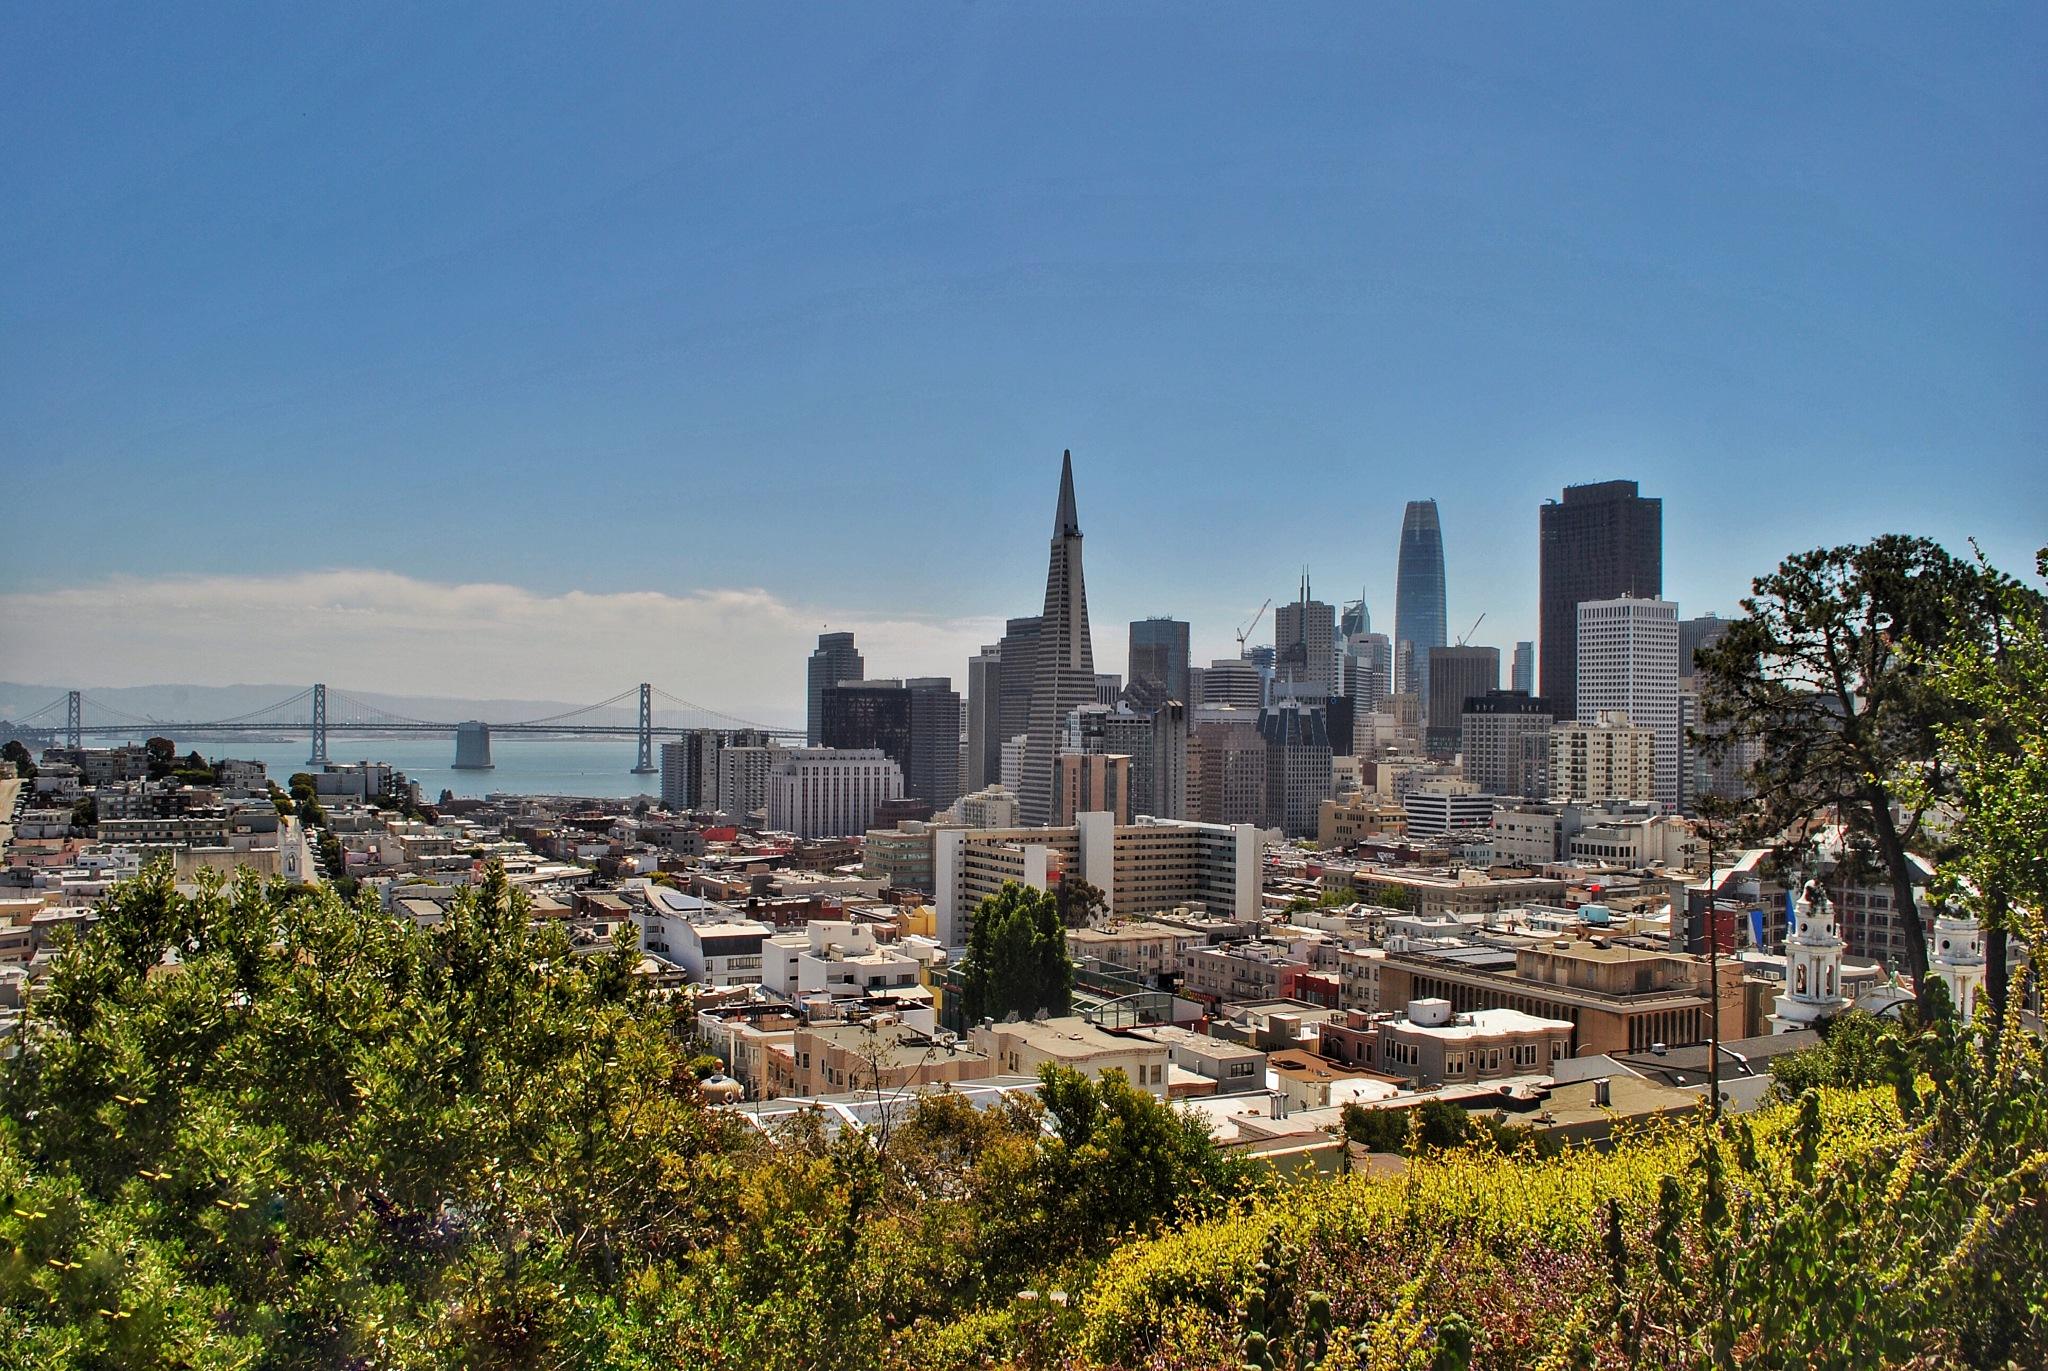 SF Skyline by Zane Rosen